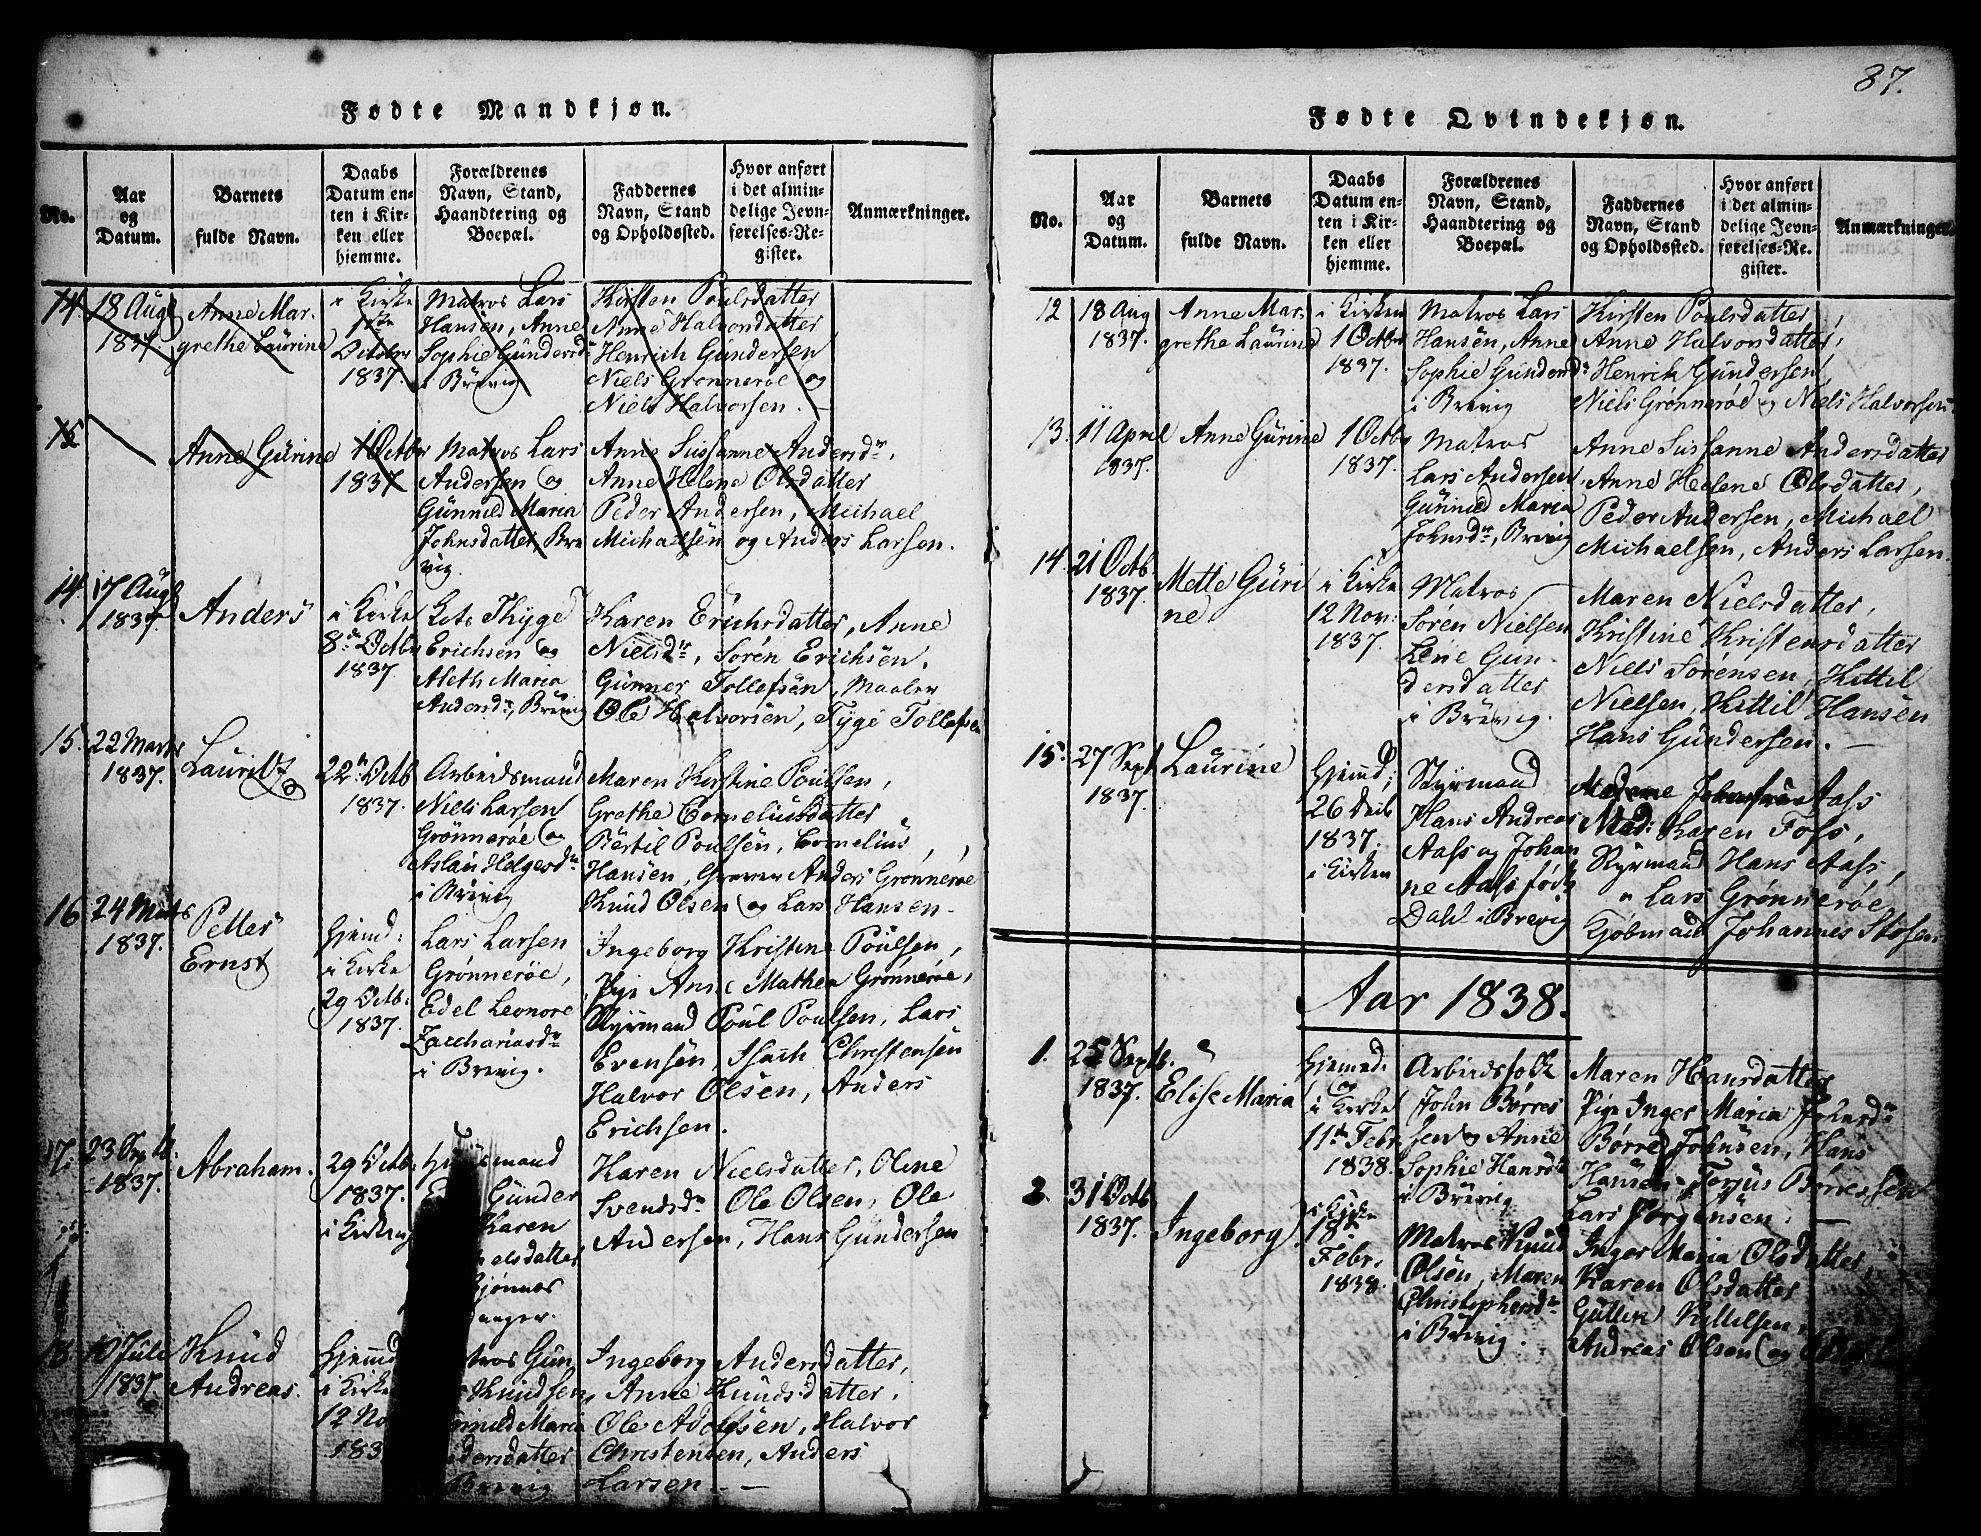 SAKO, Brevik kirkebøker, G/Ga/L0001: Klokkerbok nr. 1, 1814-1845, s. 87